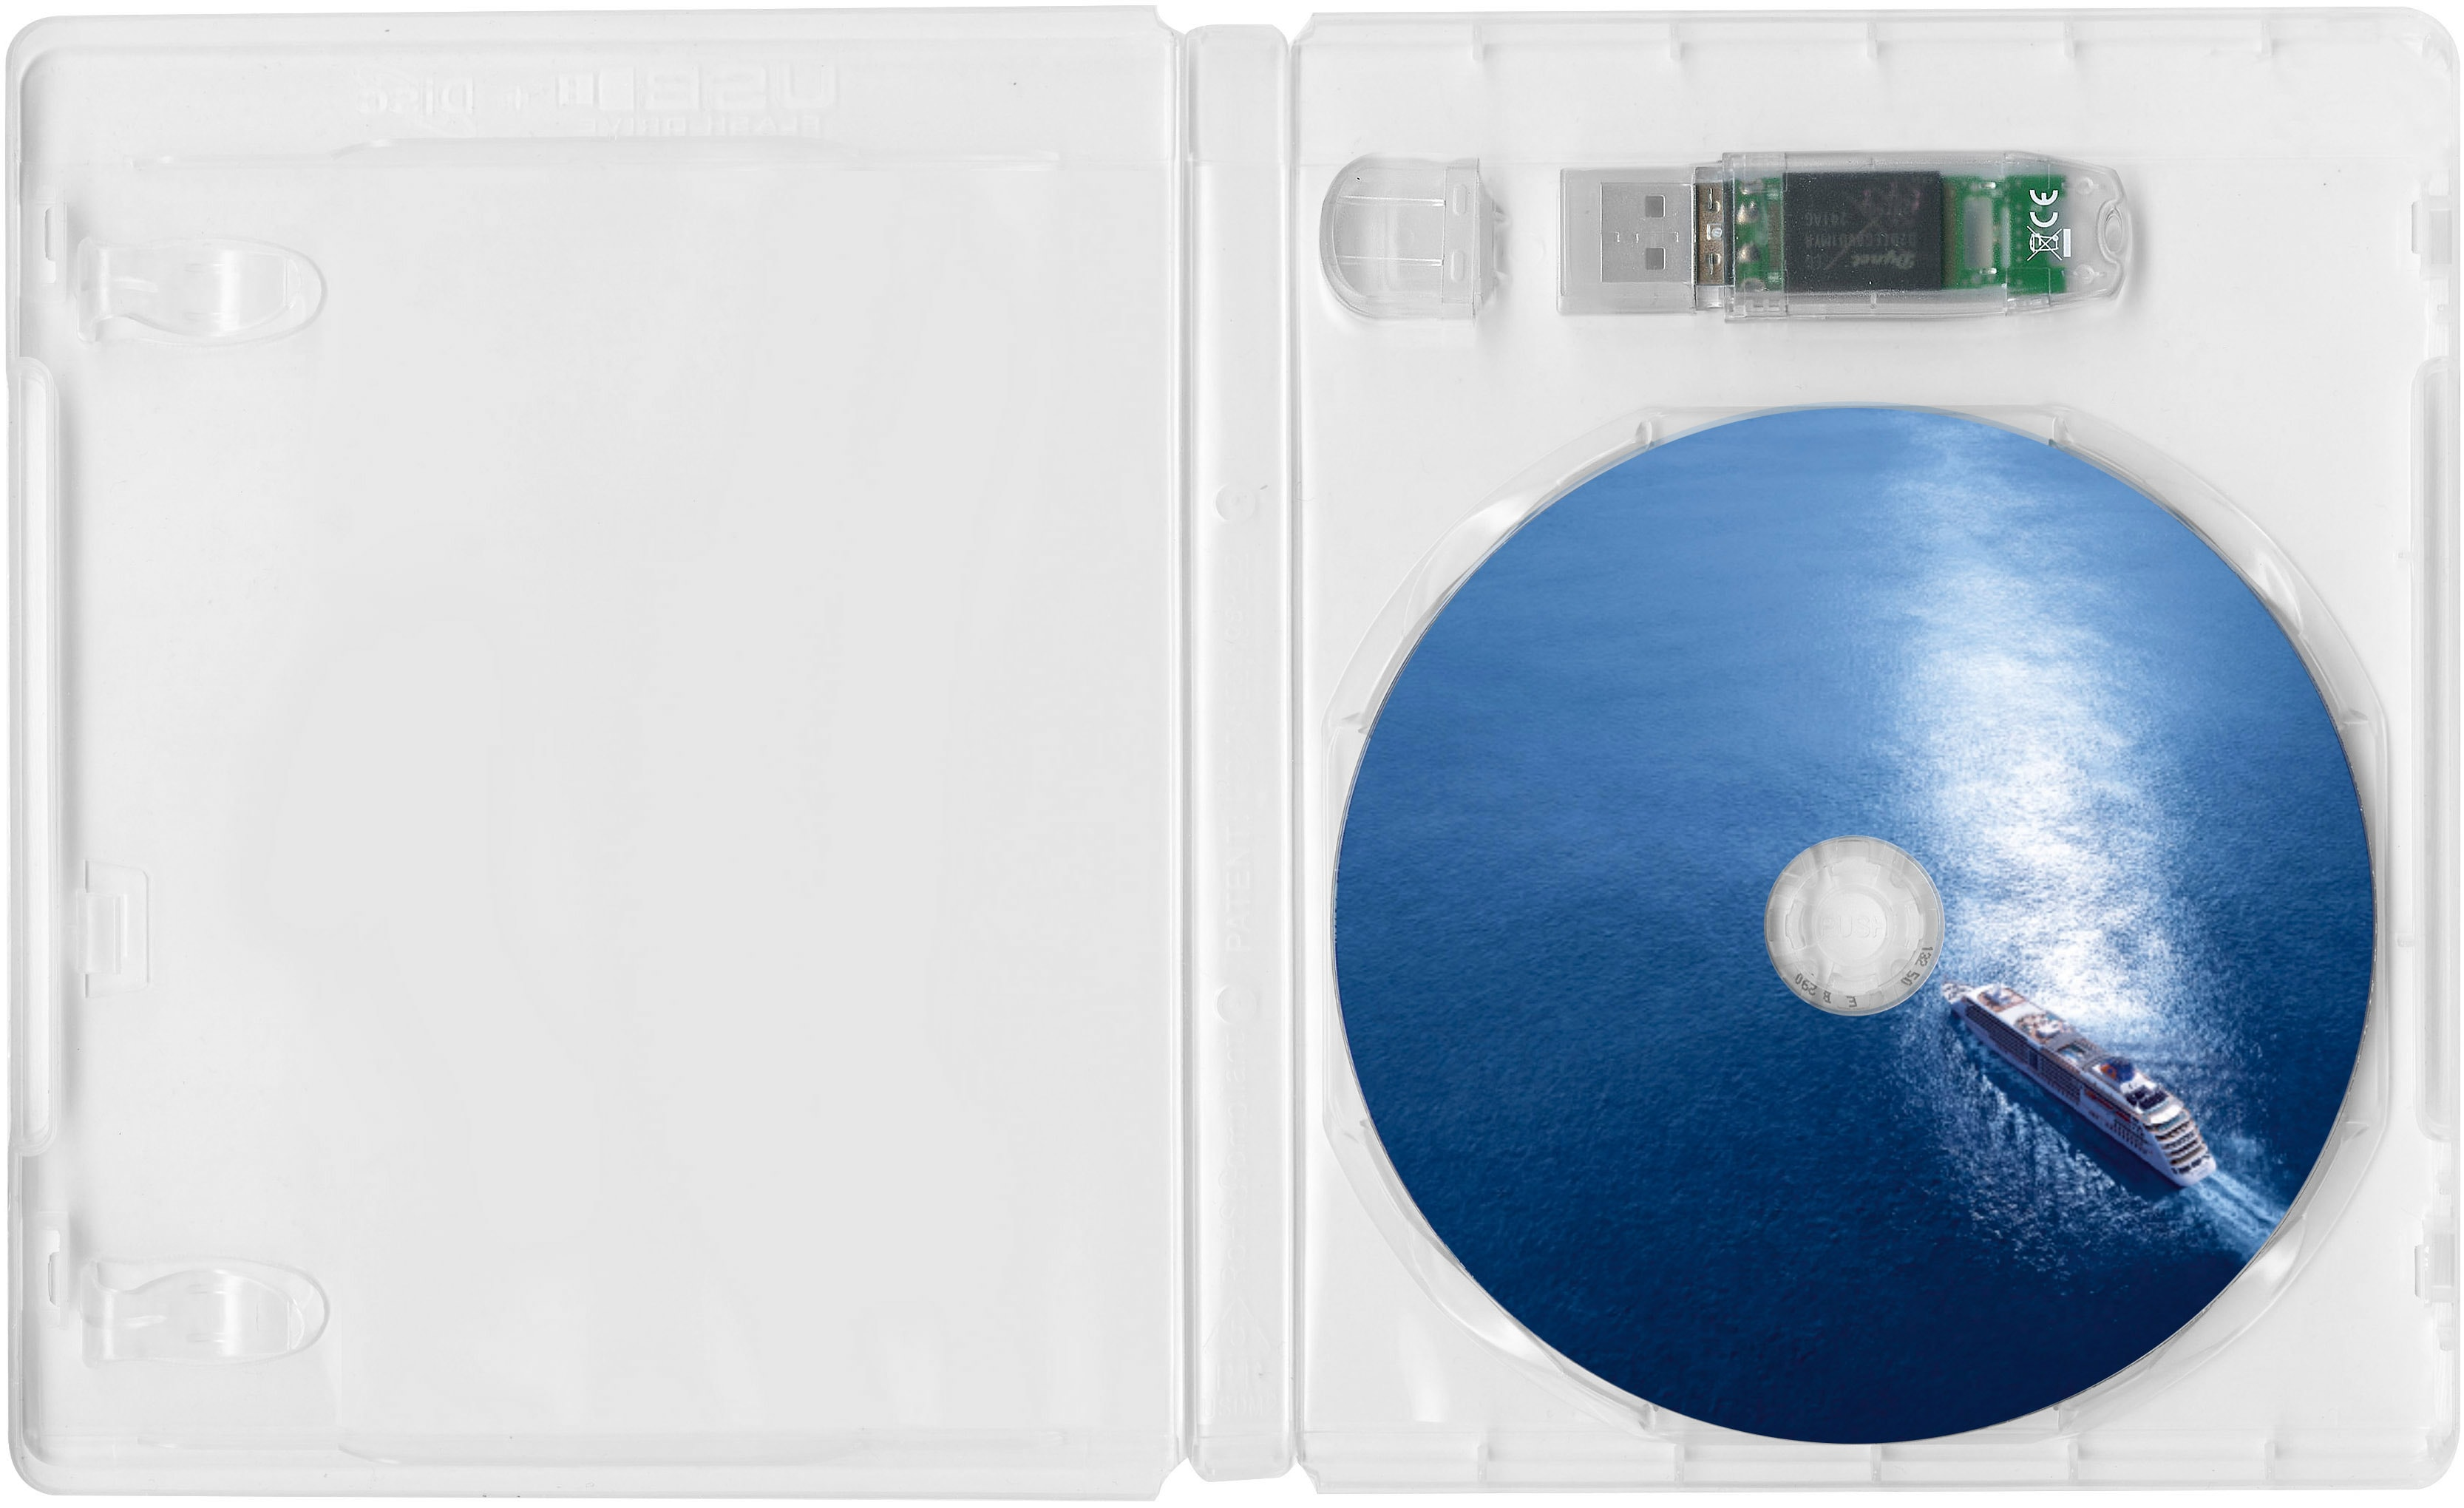 Combibox USB-Stick und Disc